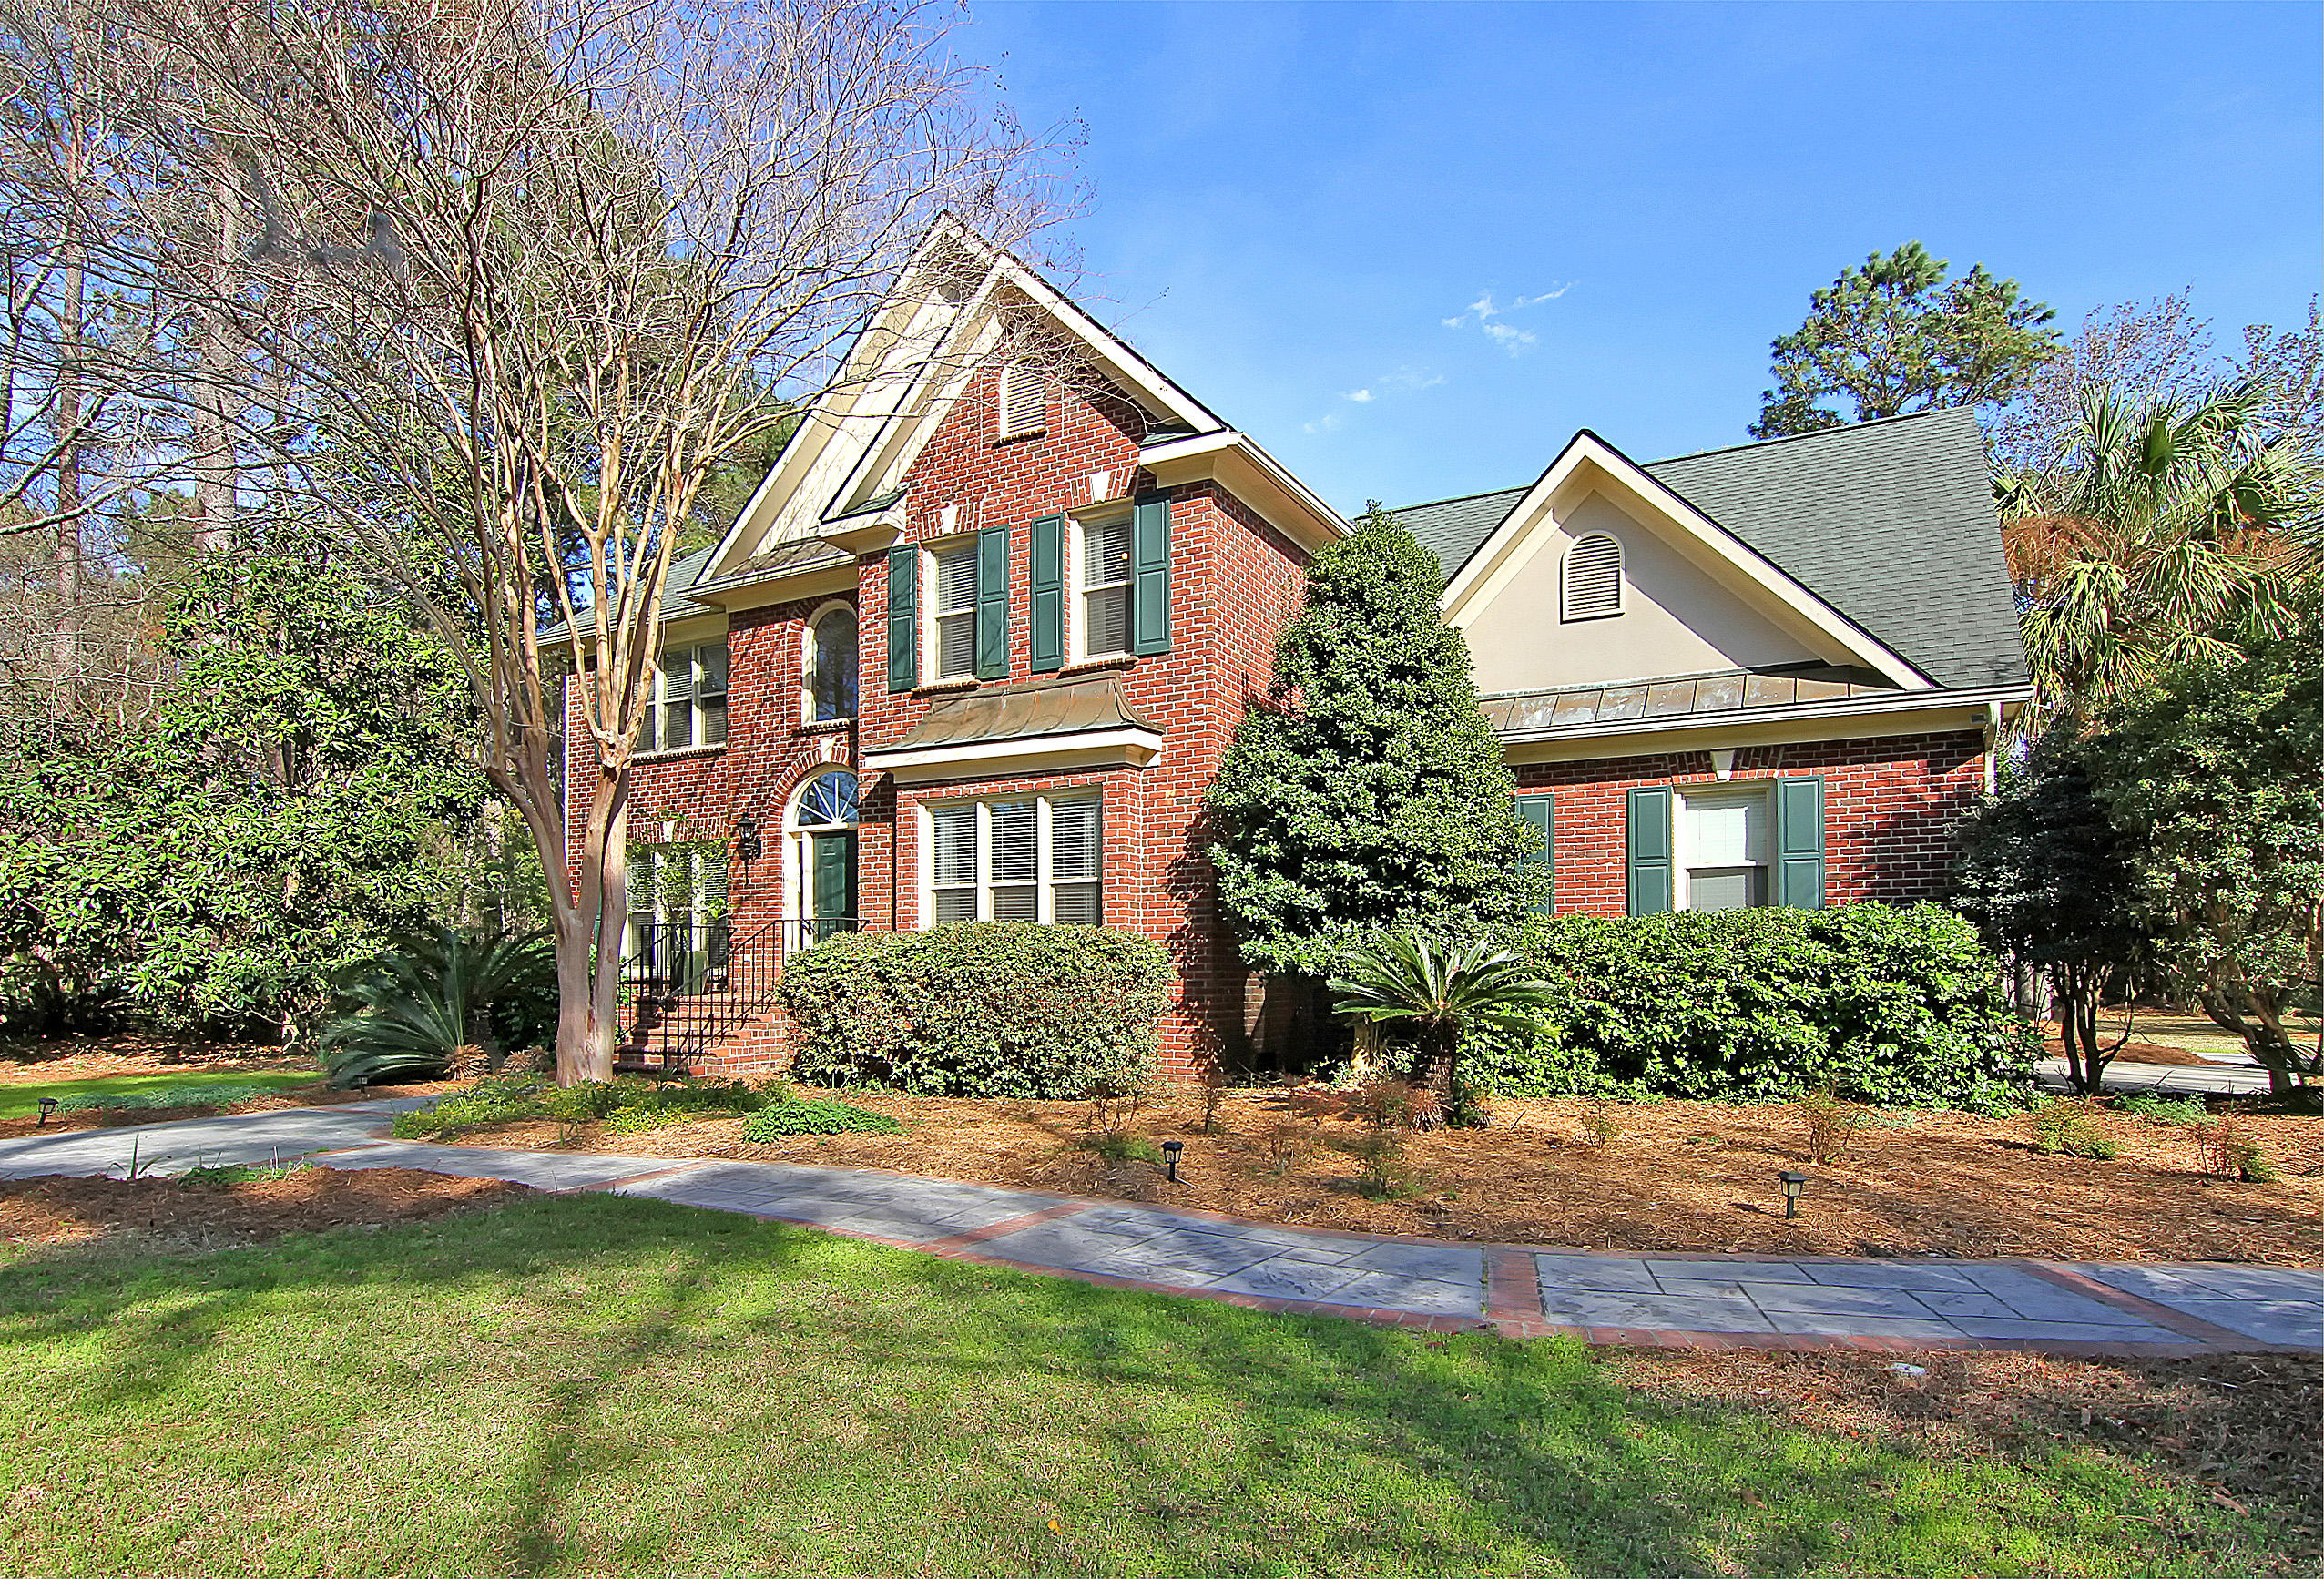 Dunes West Homes For Sale - 3463 Colonel Vanderhorst, Mount Pleasant, SC - 9